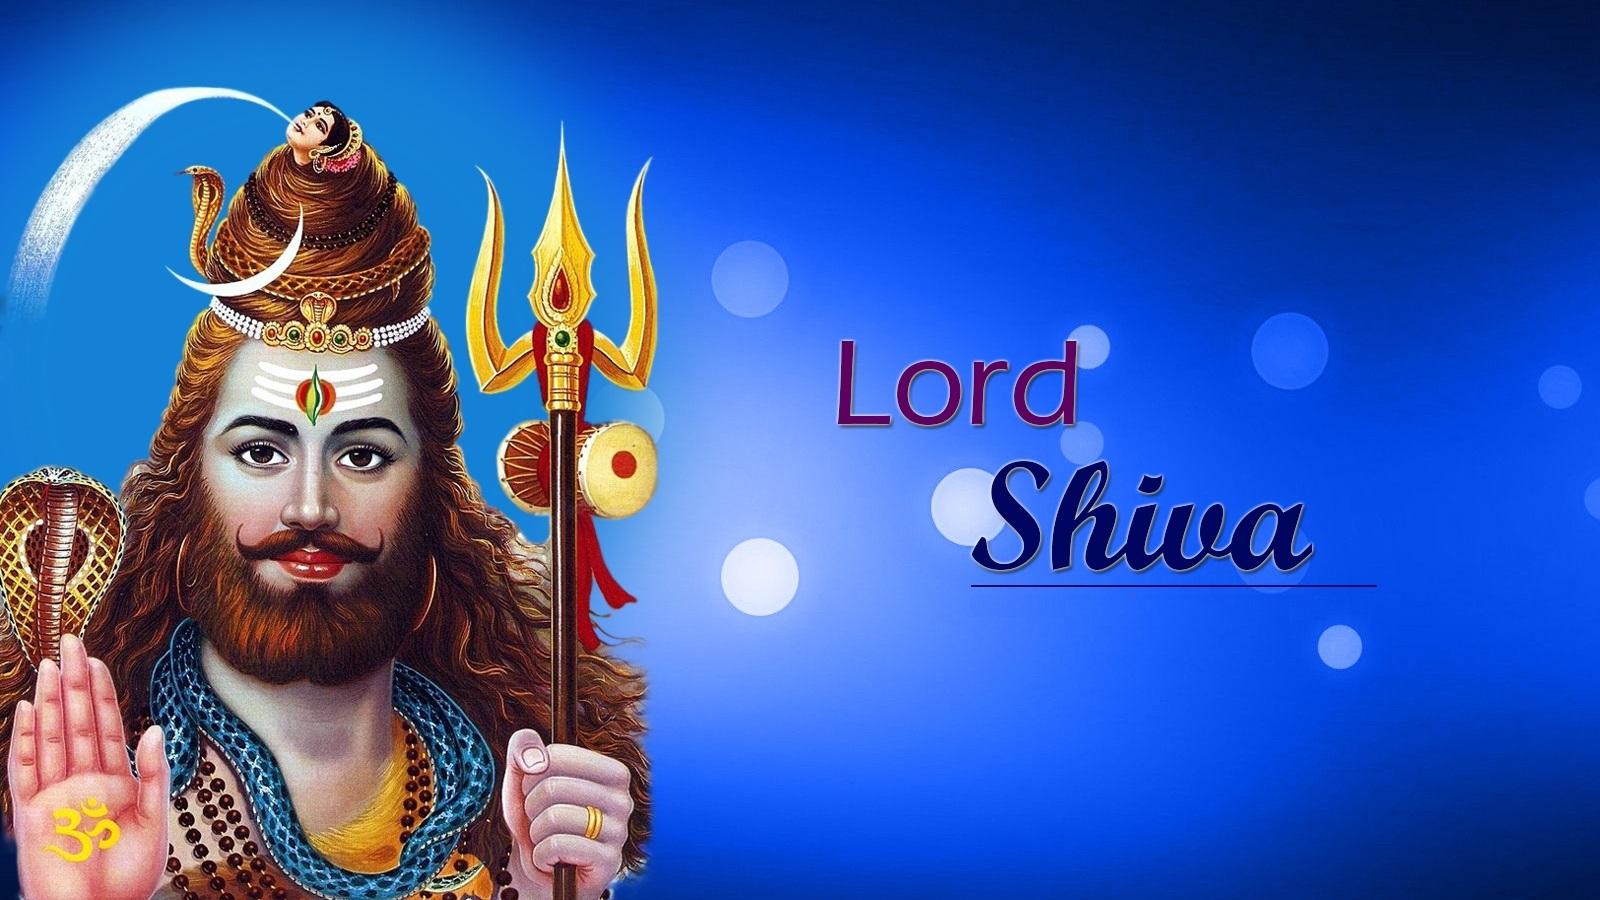 Devo Ke Dev Mahadev Wallpaper Hd Lord Shiva Hd Wallpapers Wordzz